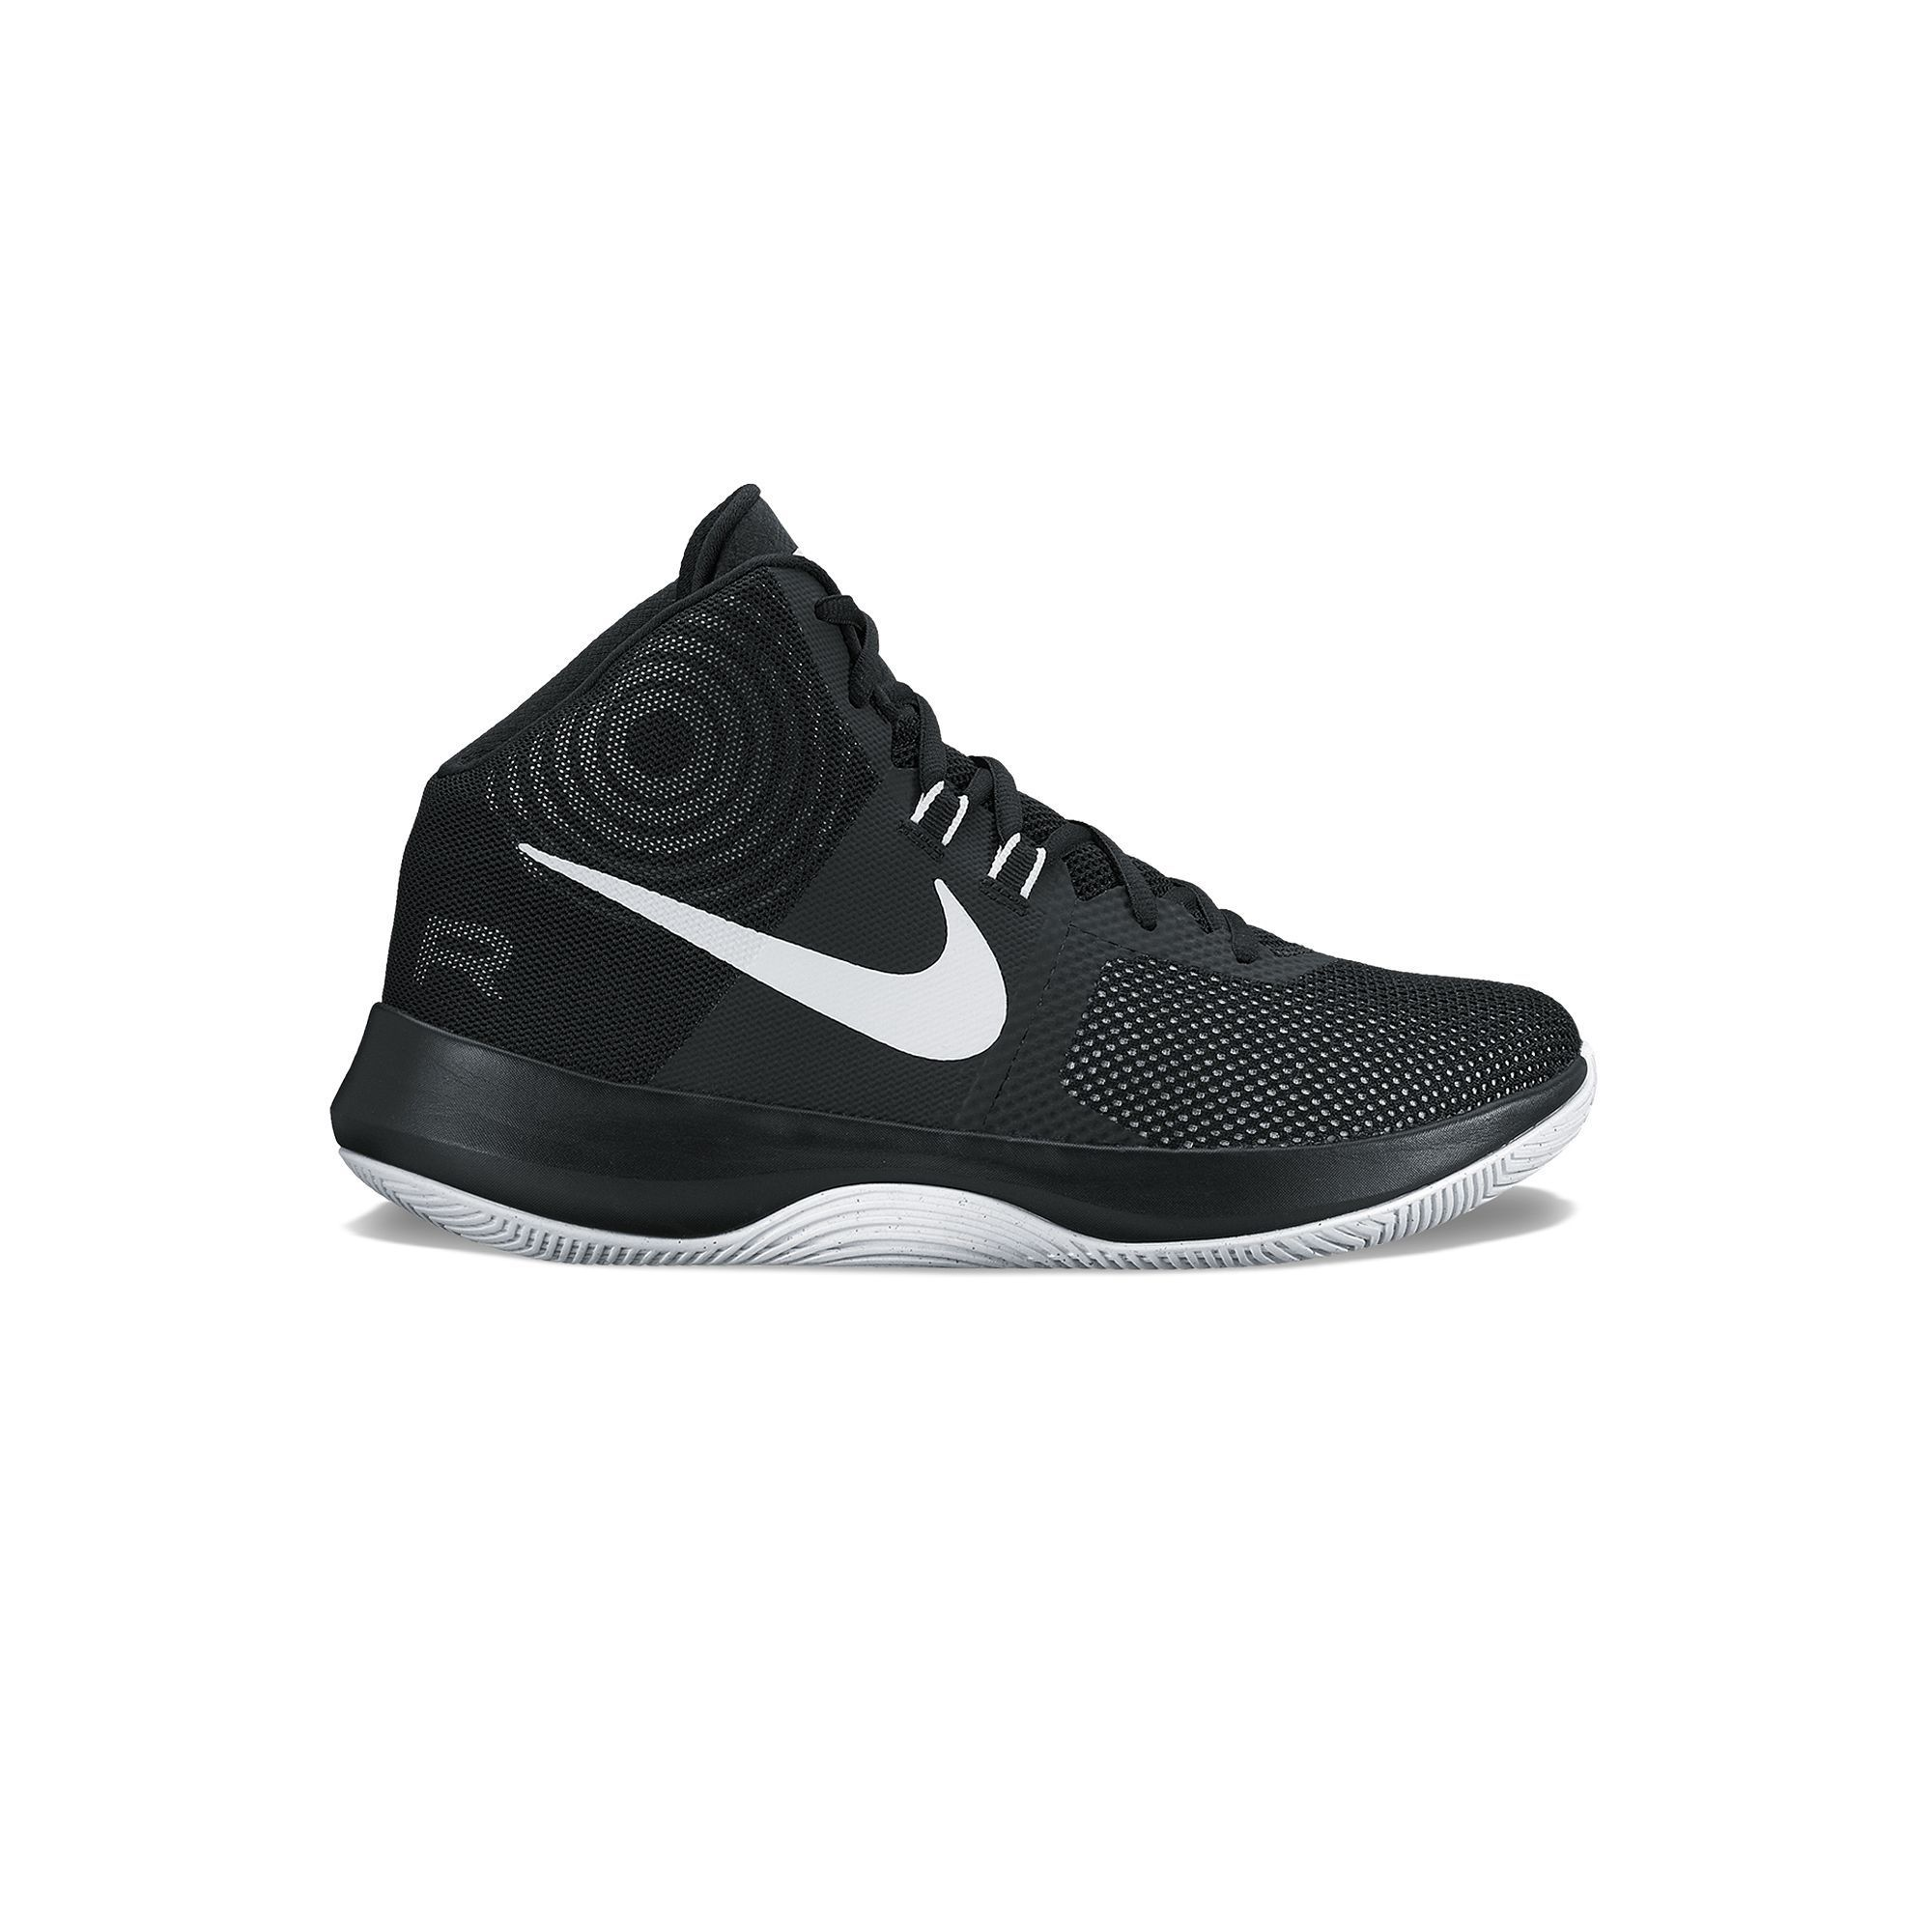 028684ae16a7 ... hot nike air precision mens basketball shoes size 14 52c17 ecd4f ...